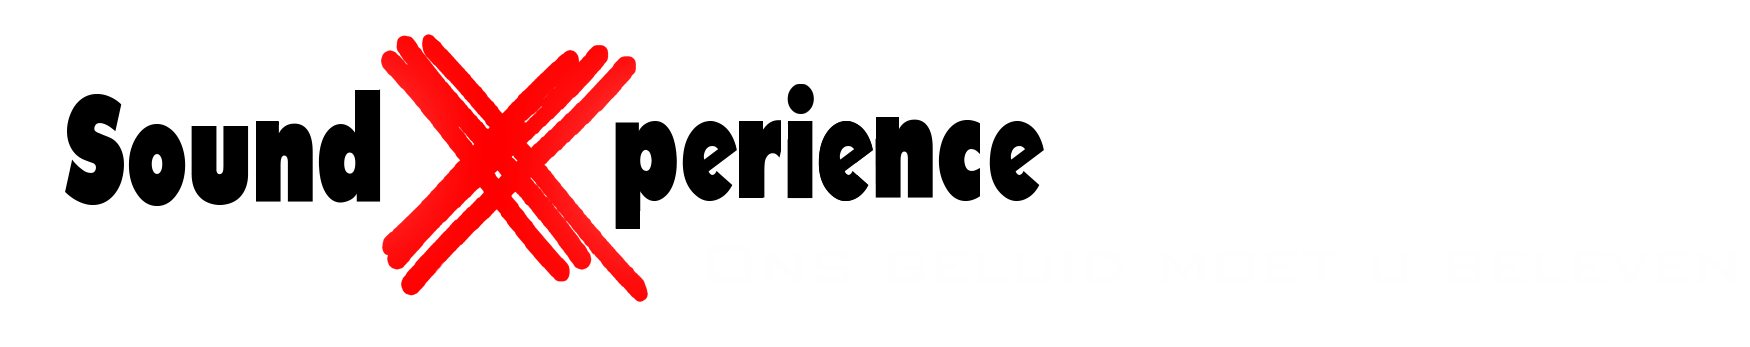 Soundxperience